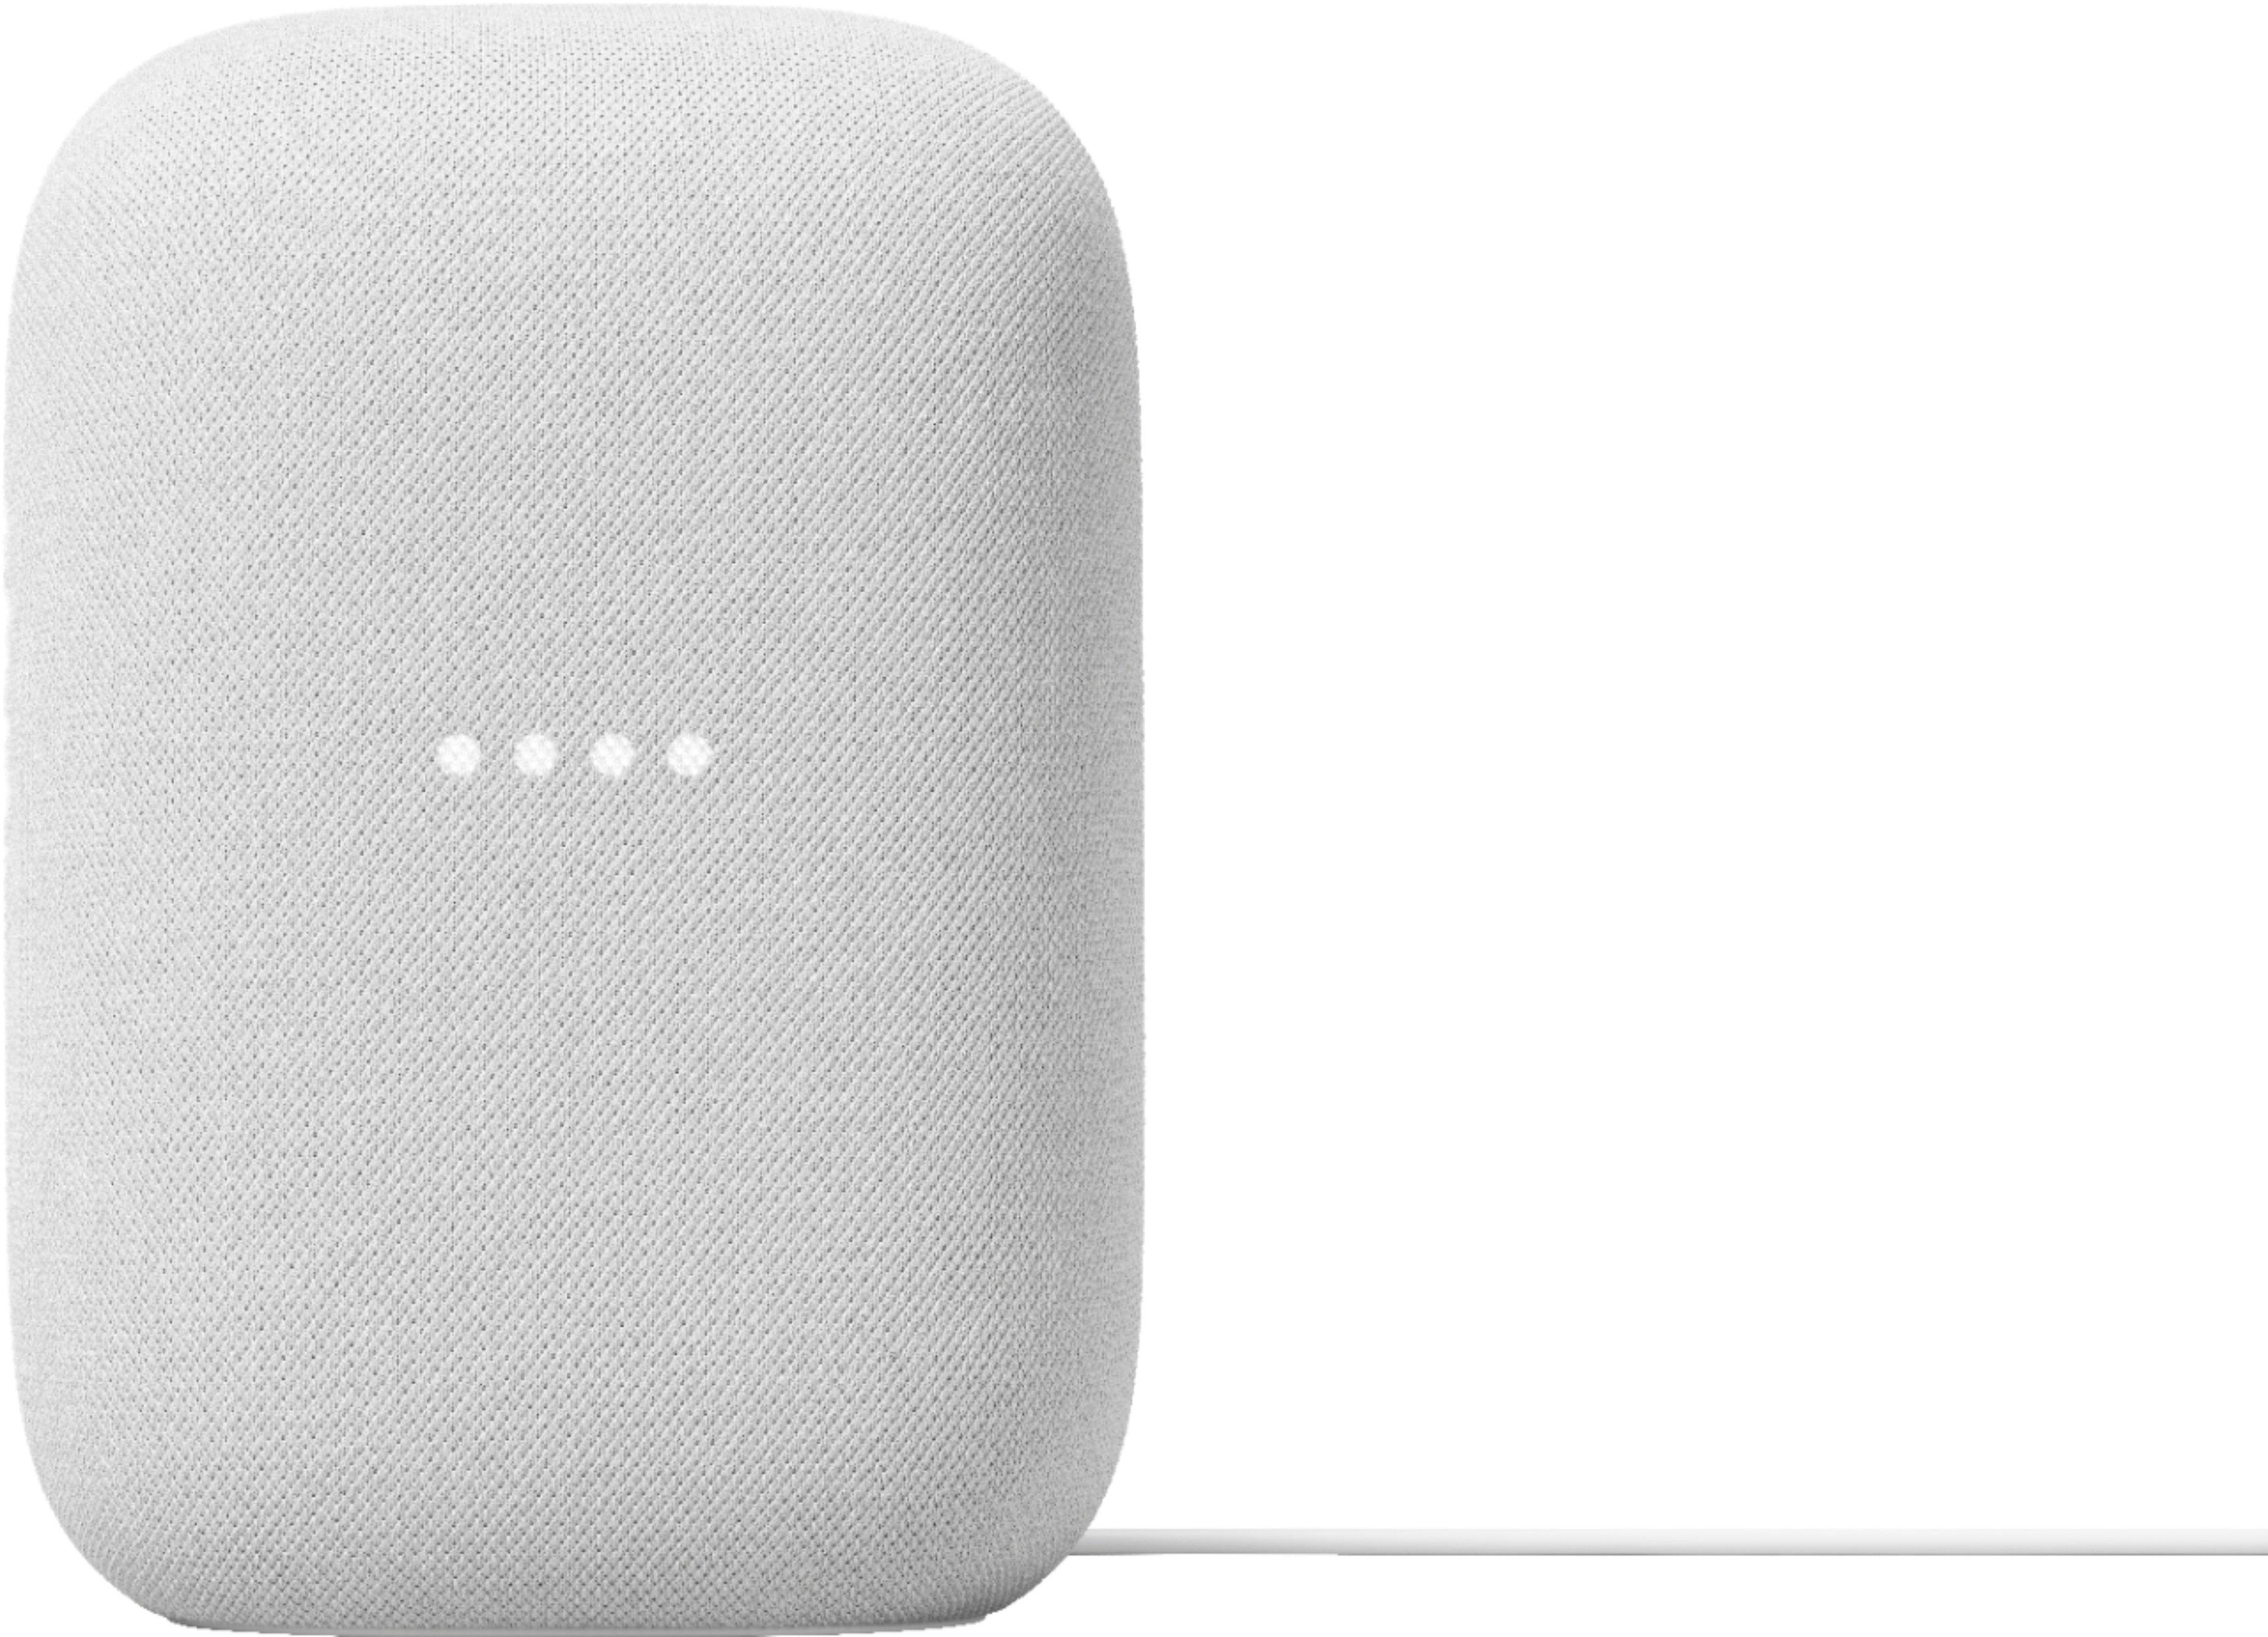 Google Nest Audio - Targeted discount (YMMV) $75